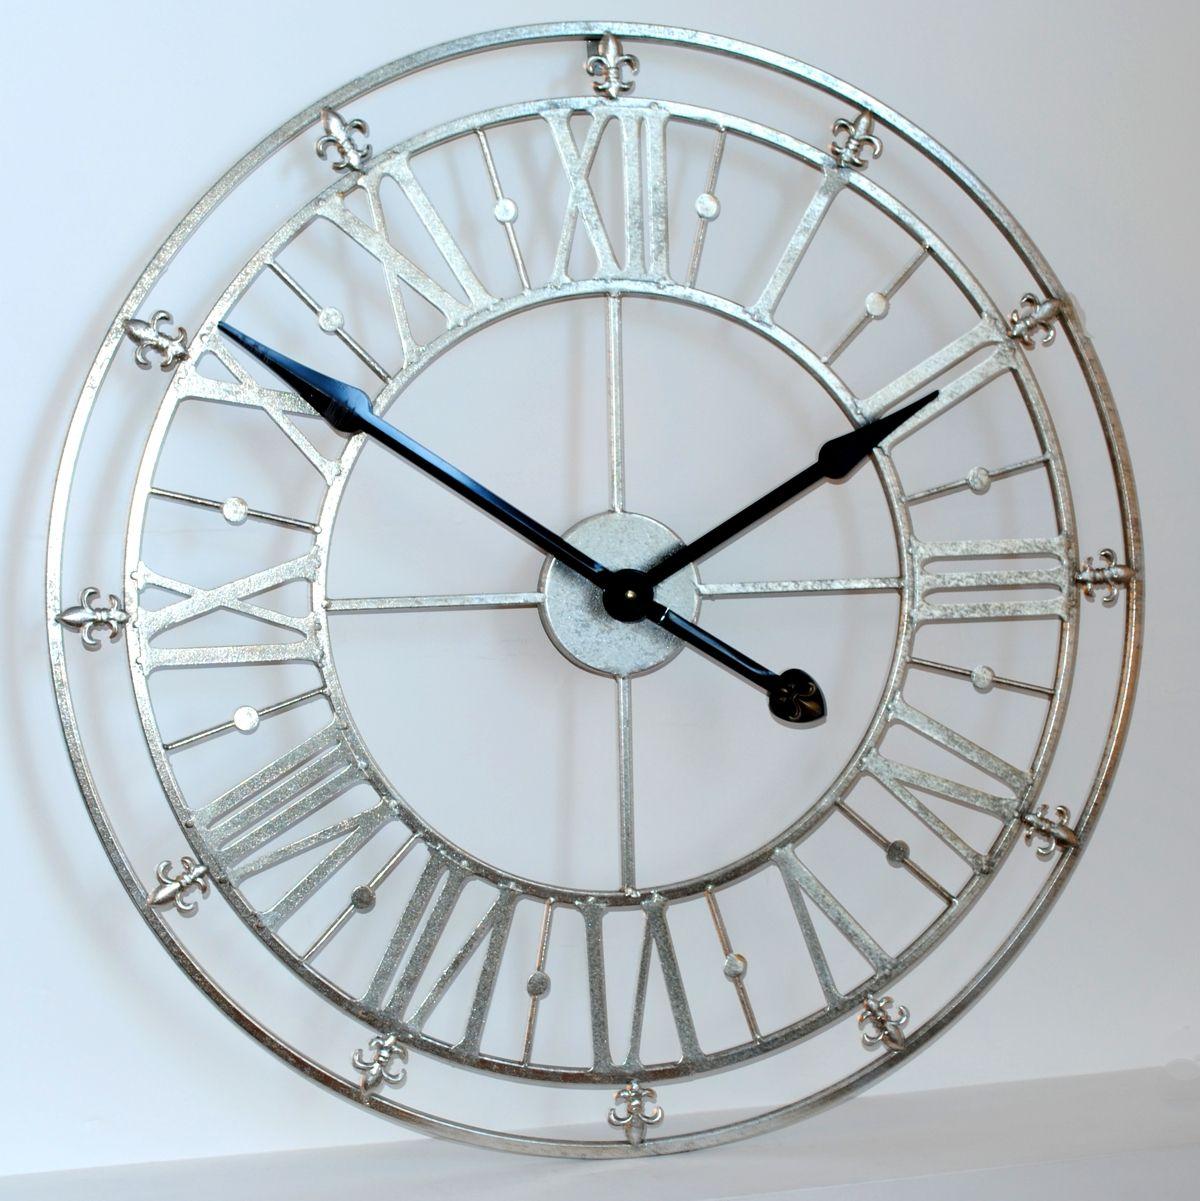 Silver Iron Skeleton Wall Clock 76cm 30 Diameter Big Wall Clocks Oversized Wall Clock Wall Clocks Uk